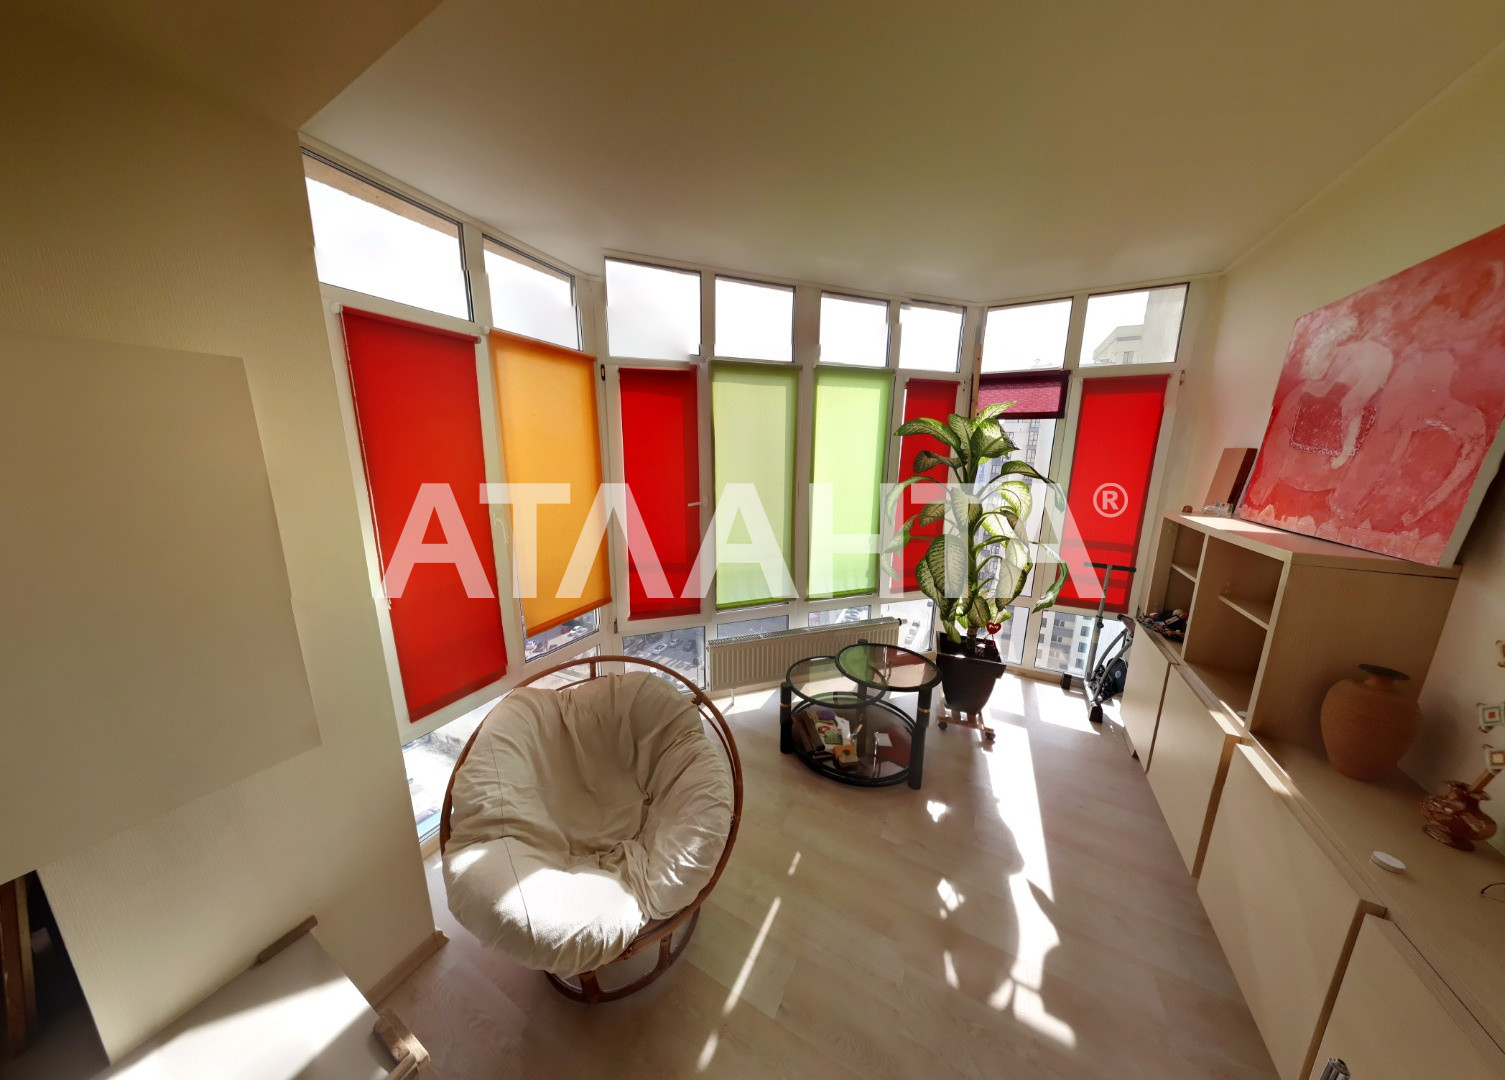 Продается 3-комнатная Квартира на ул. Ломоносова — 118 900 у.е. (фото №7)